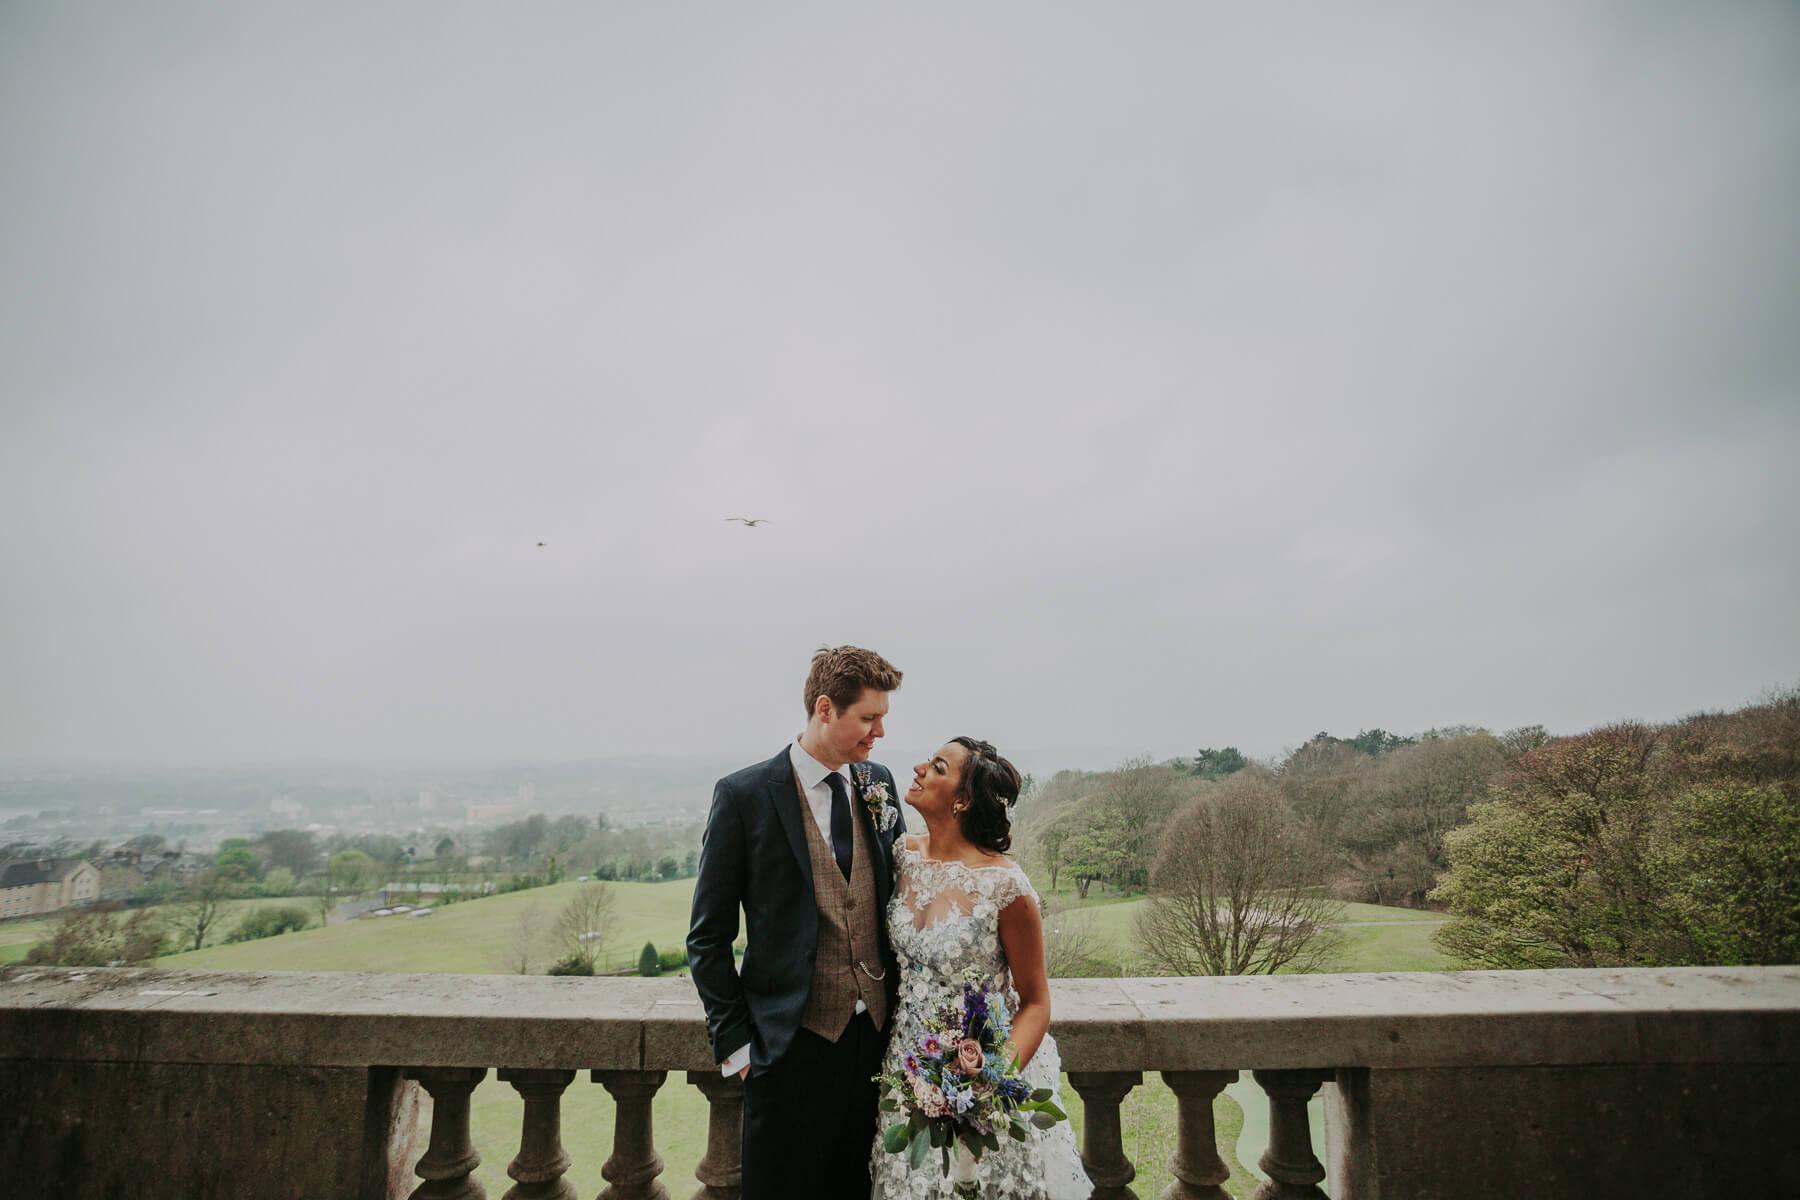 Domino & Pete | Lancaster Memorial wedding 83